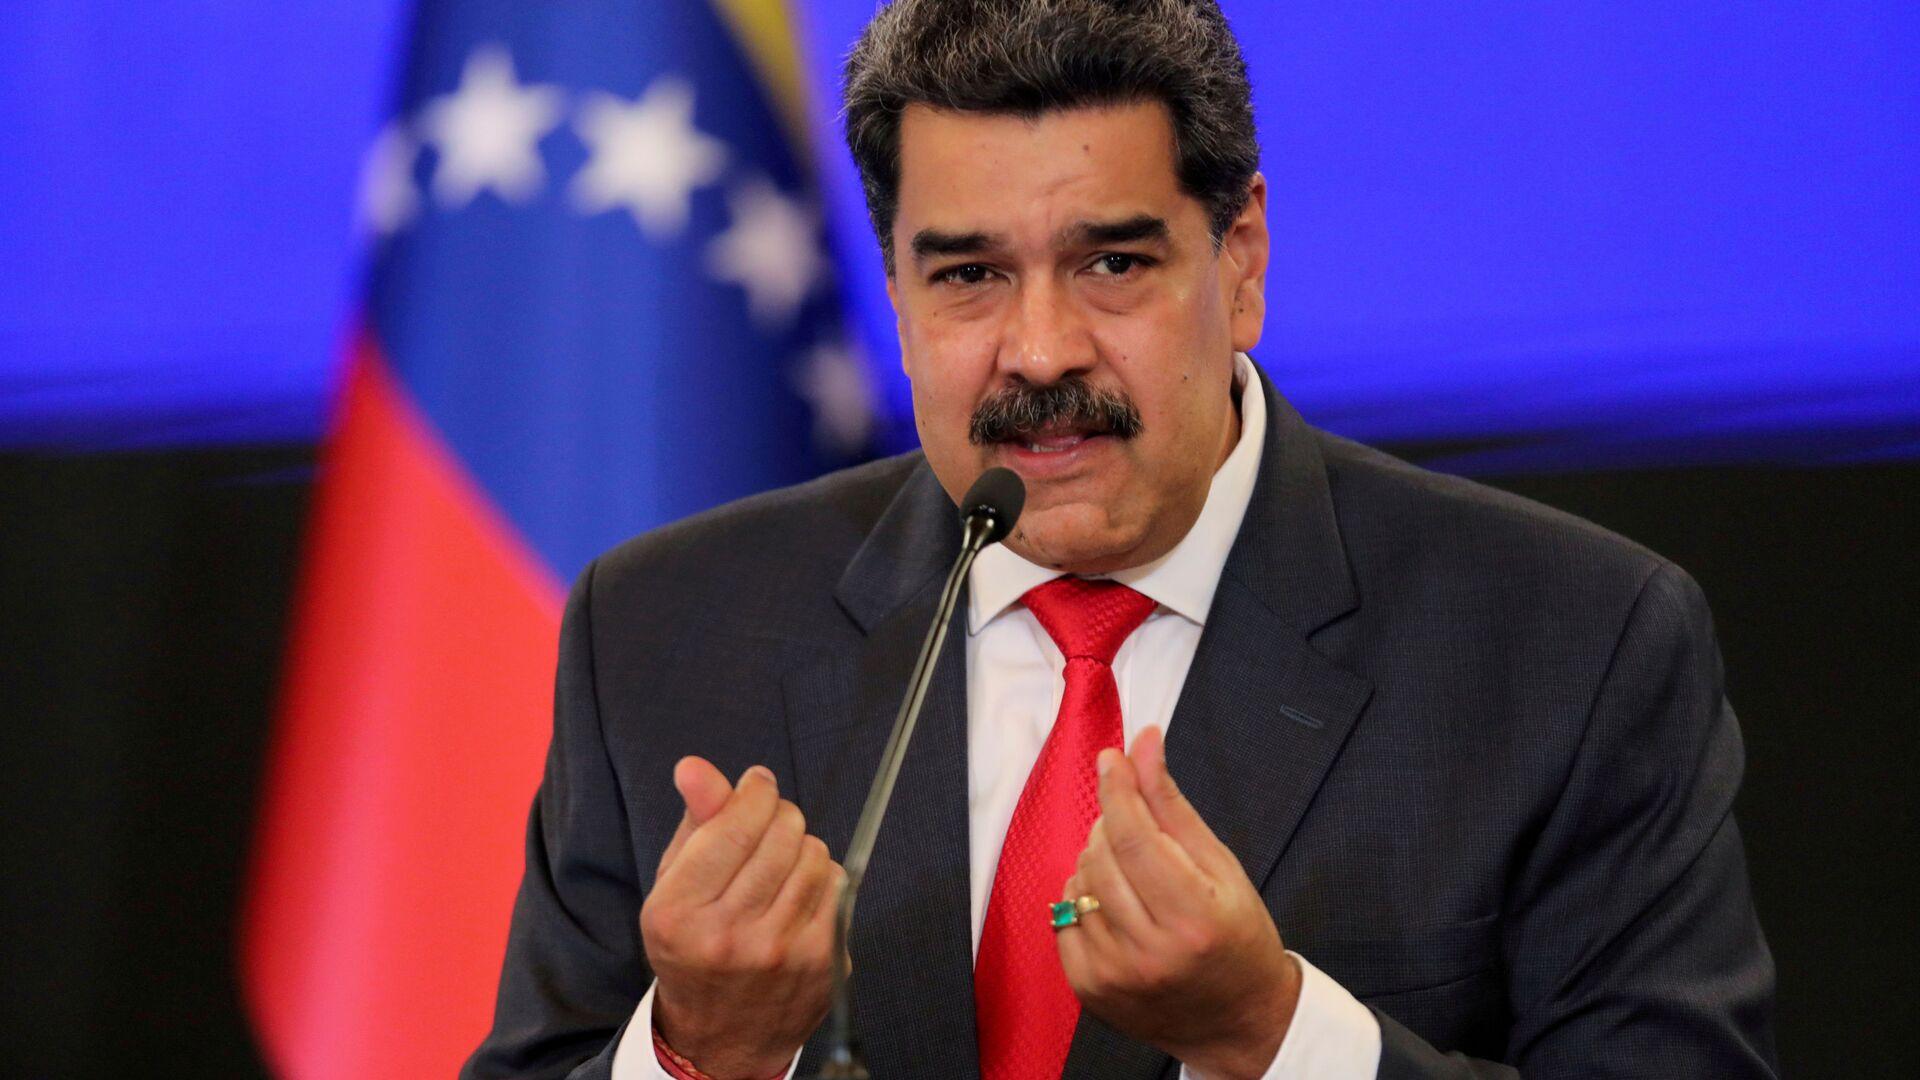 Prezydent Wenezueli Nicolas Maduro. - Sputnik Polska, 1920, 14.07.2021